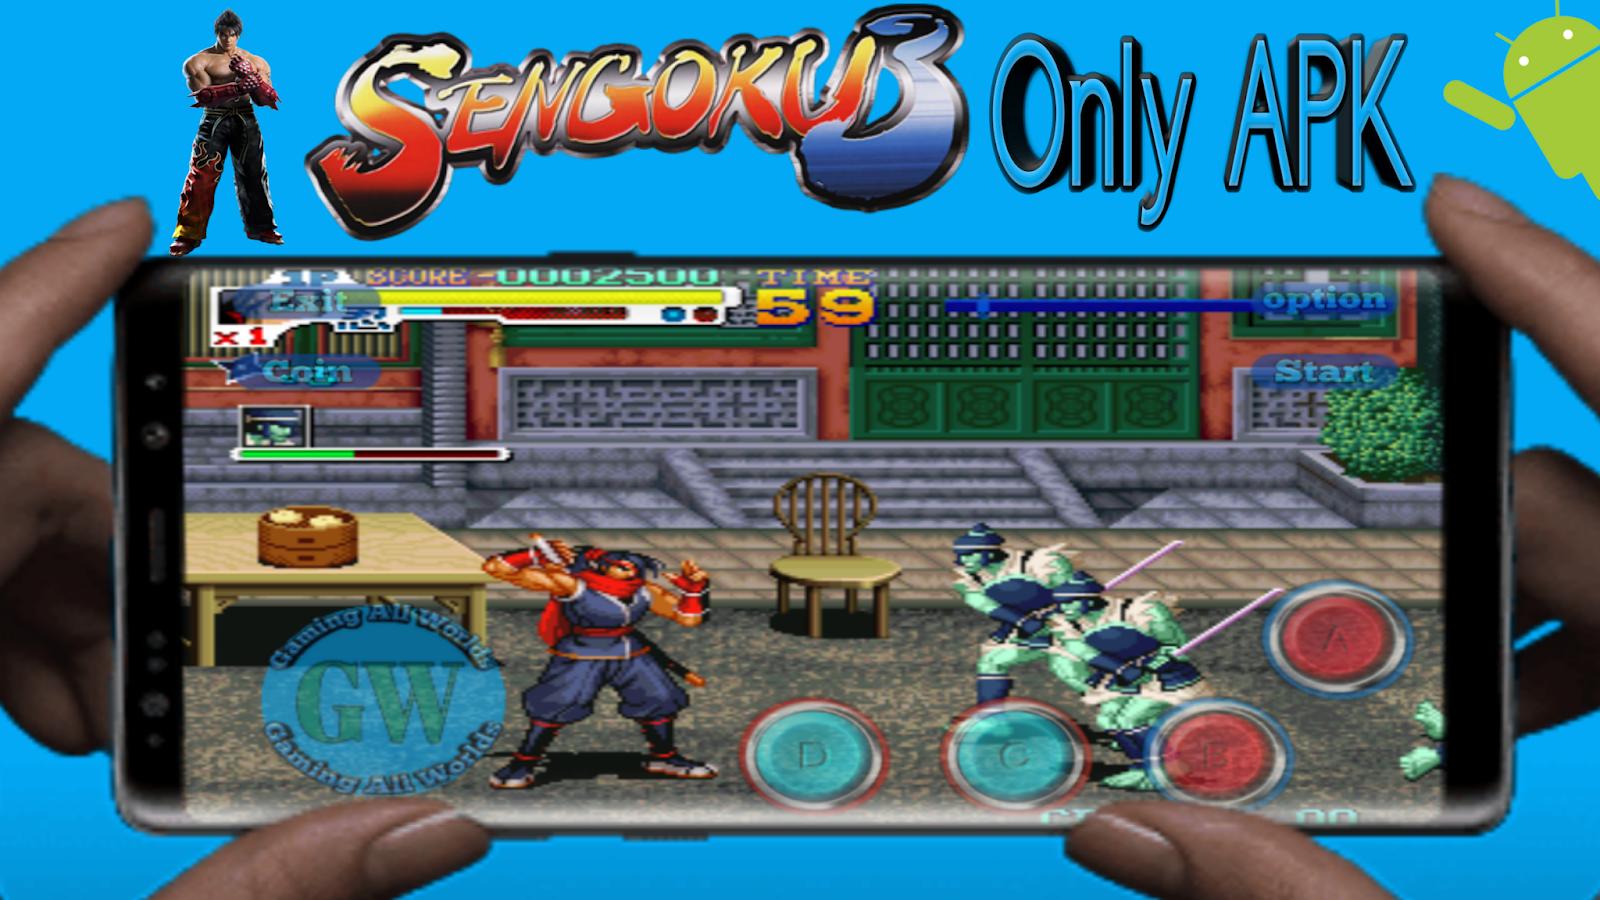 Sengoku 3 Game Only APK - GamingAllWorlds